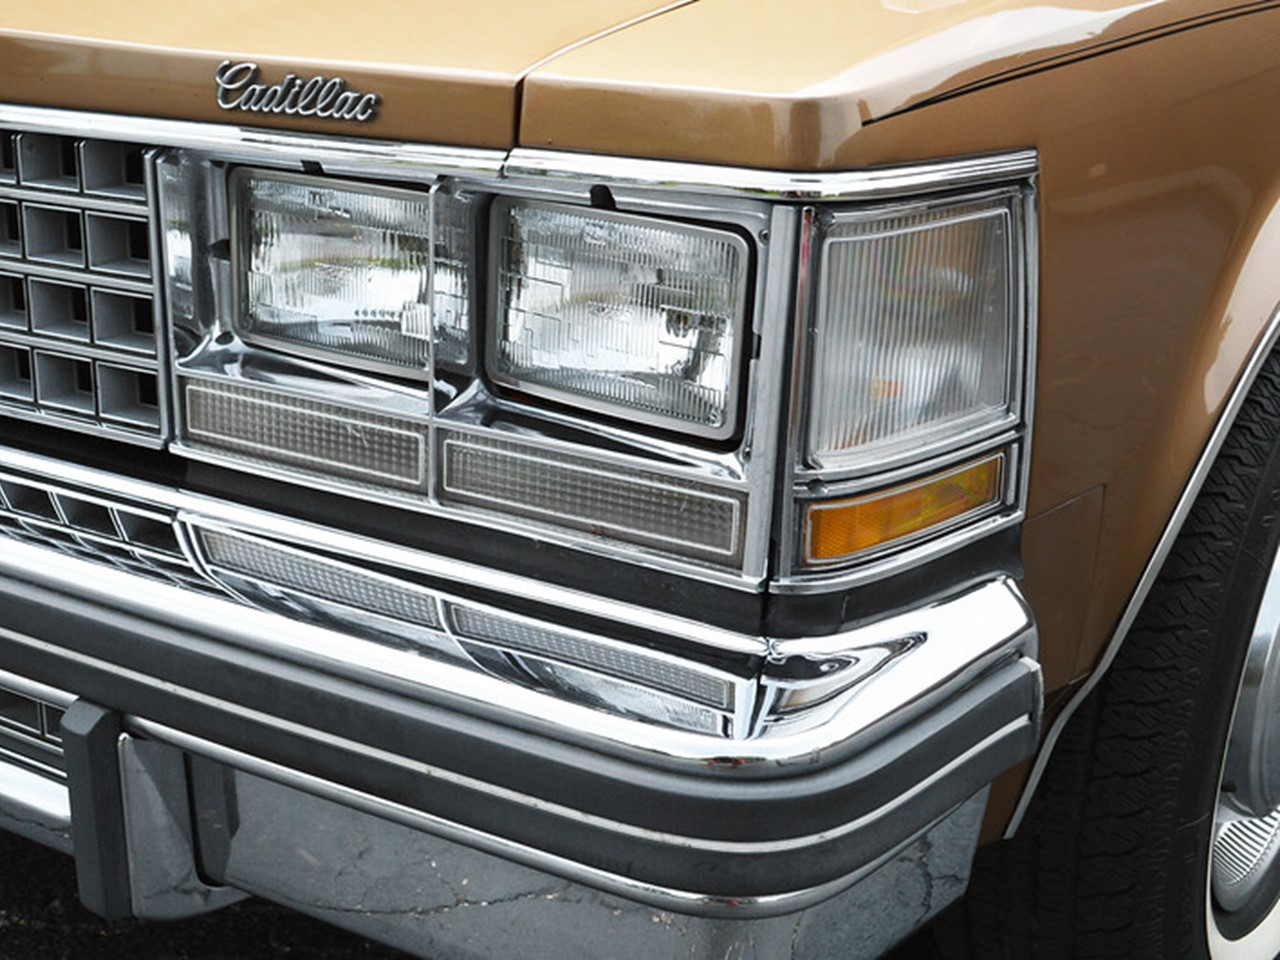 1976 Cadillac Seville 9